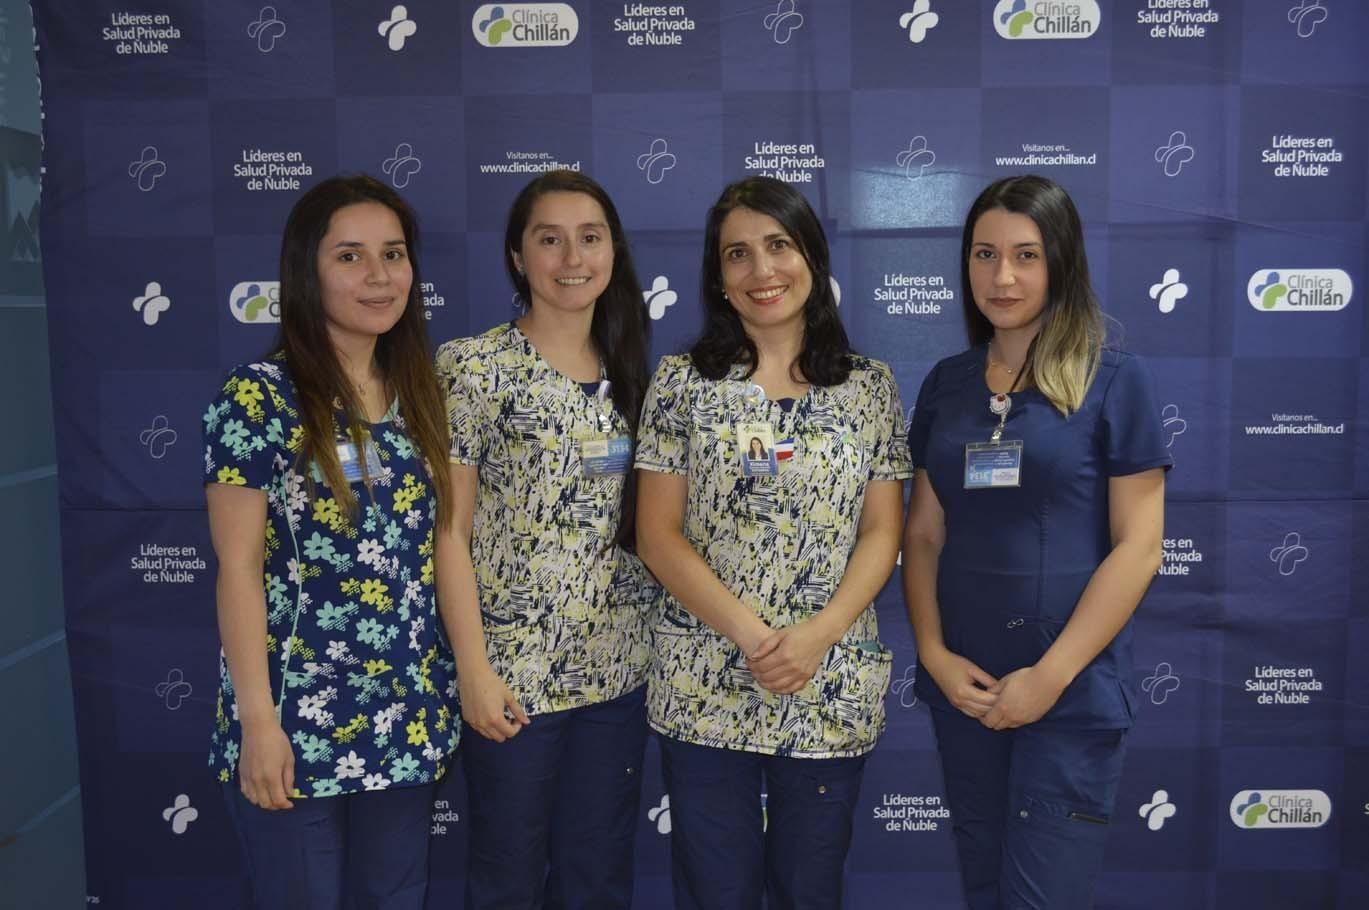 Paola Vilches, Kennia Jara, Jimena Guzmán y Macarena Coloma